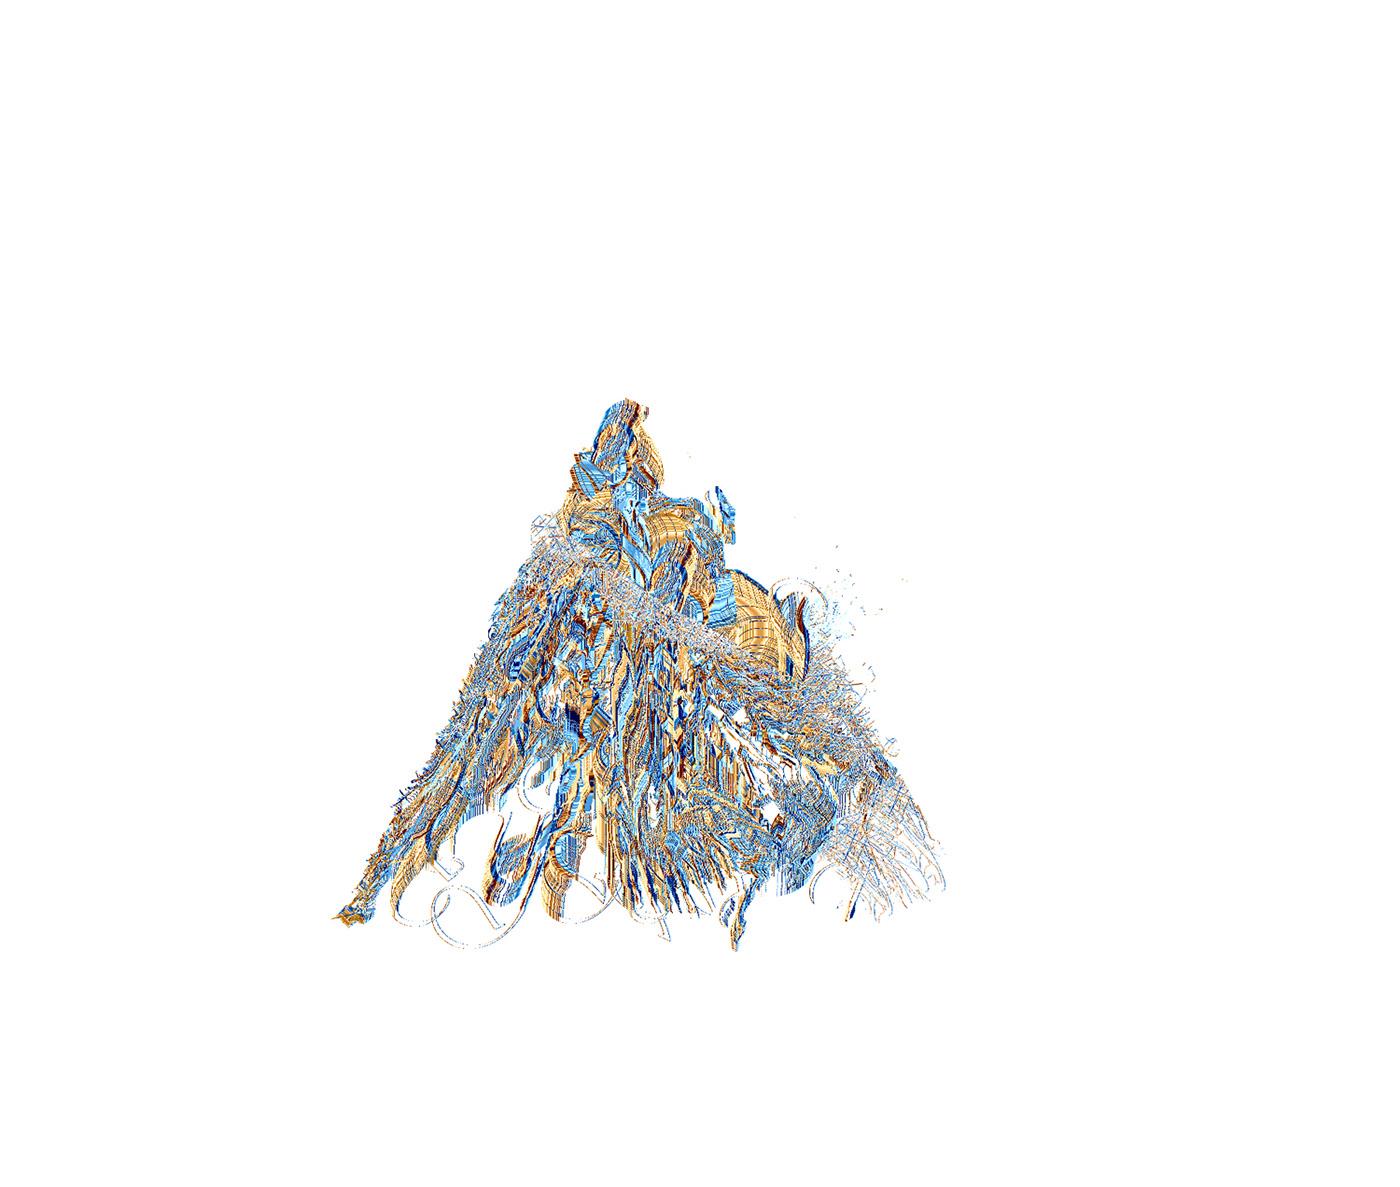 Digital Drawing Drawing  landscape drawing ms paint Pixel art